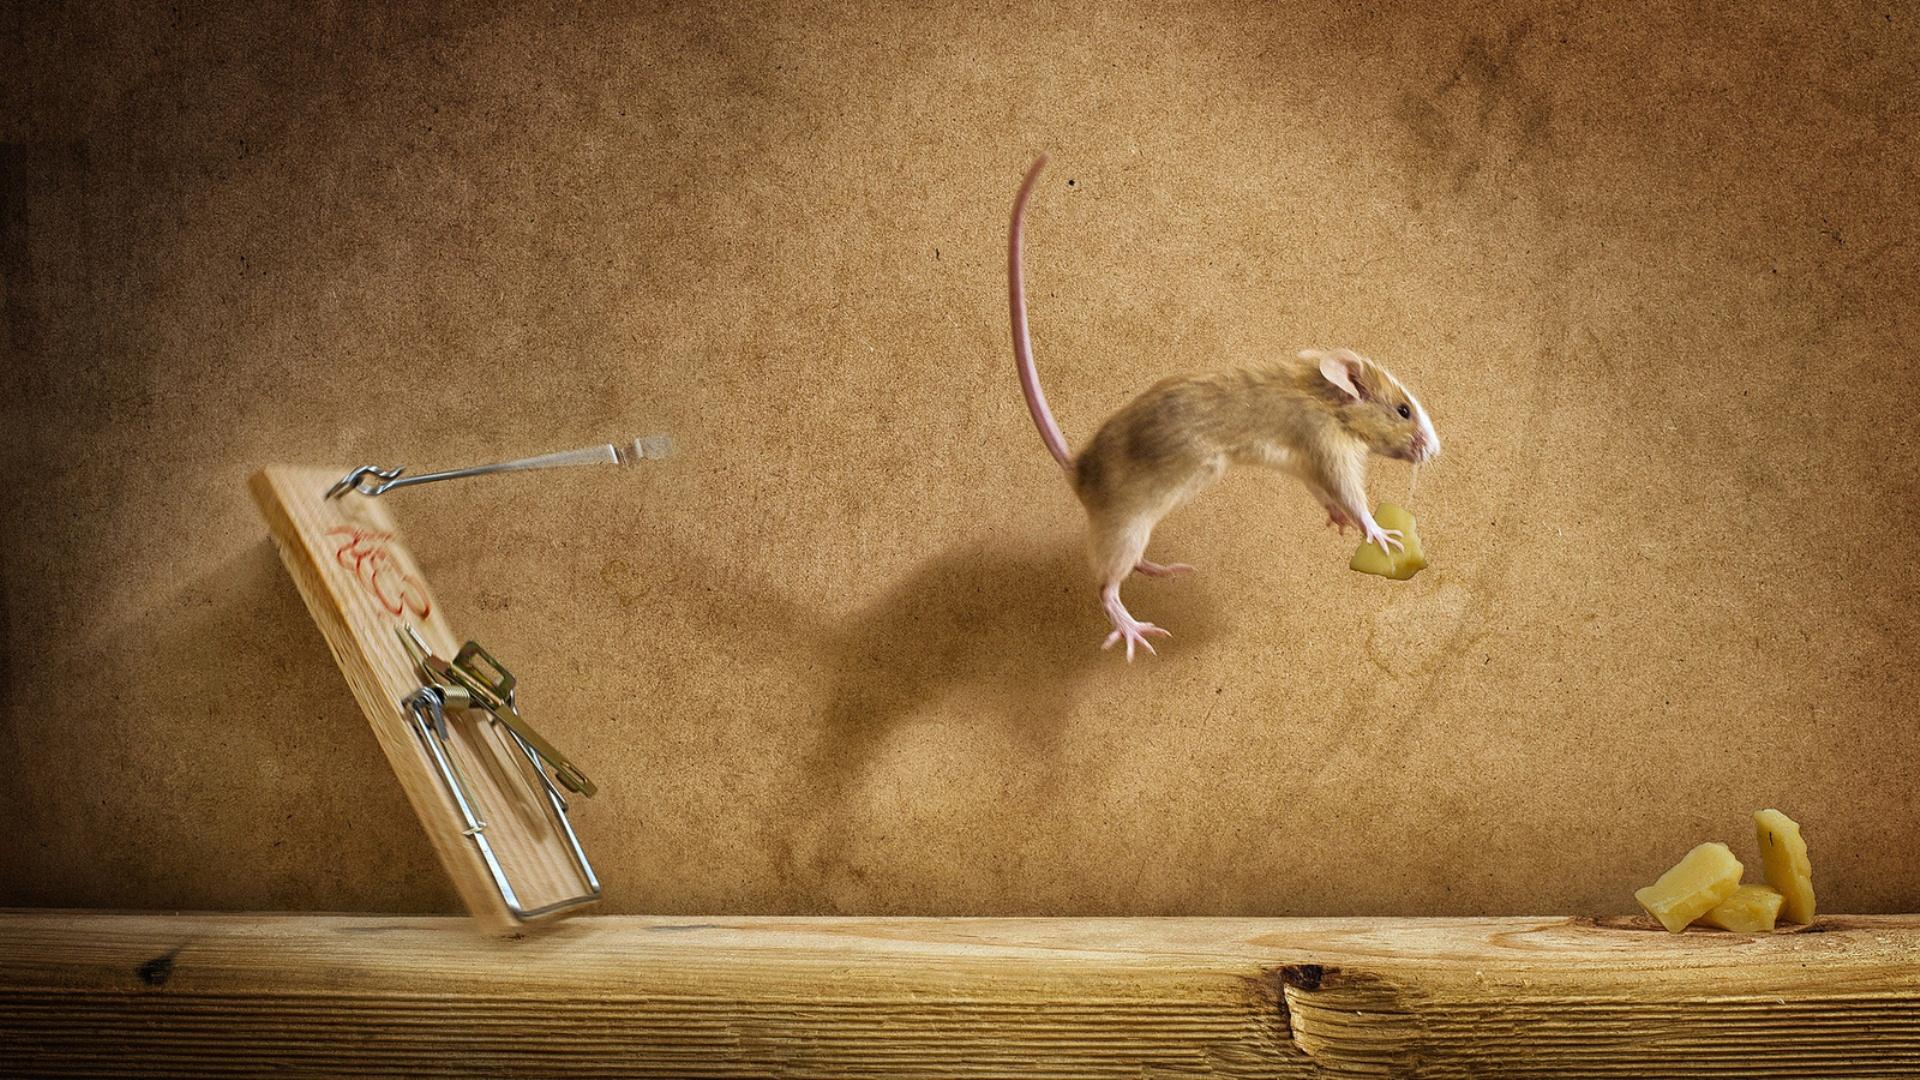 эти картинки из жизни мышек буквы